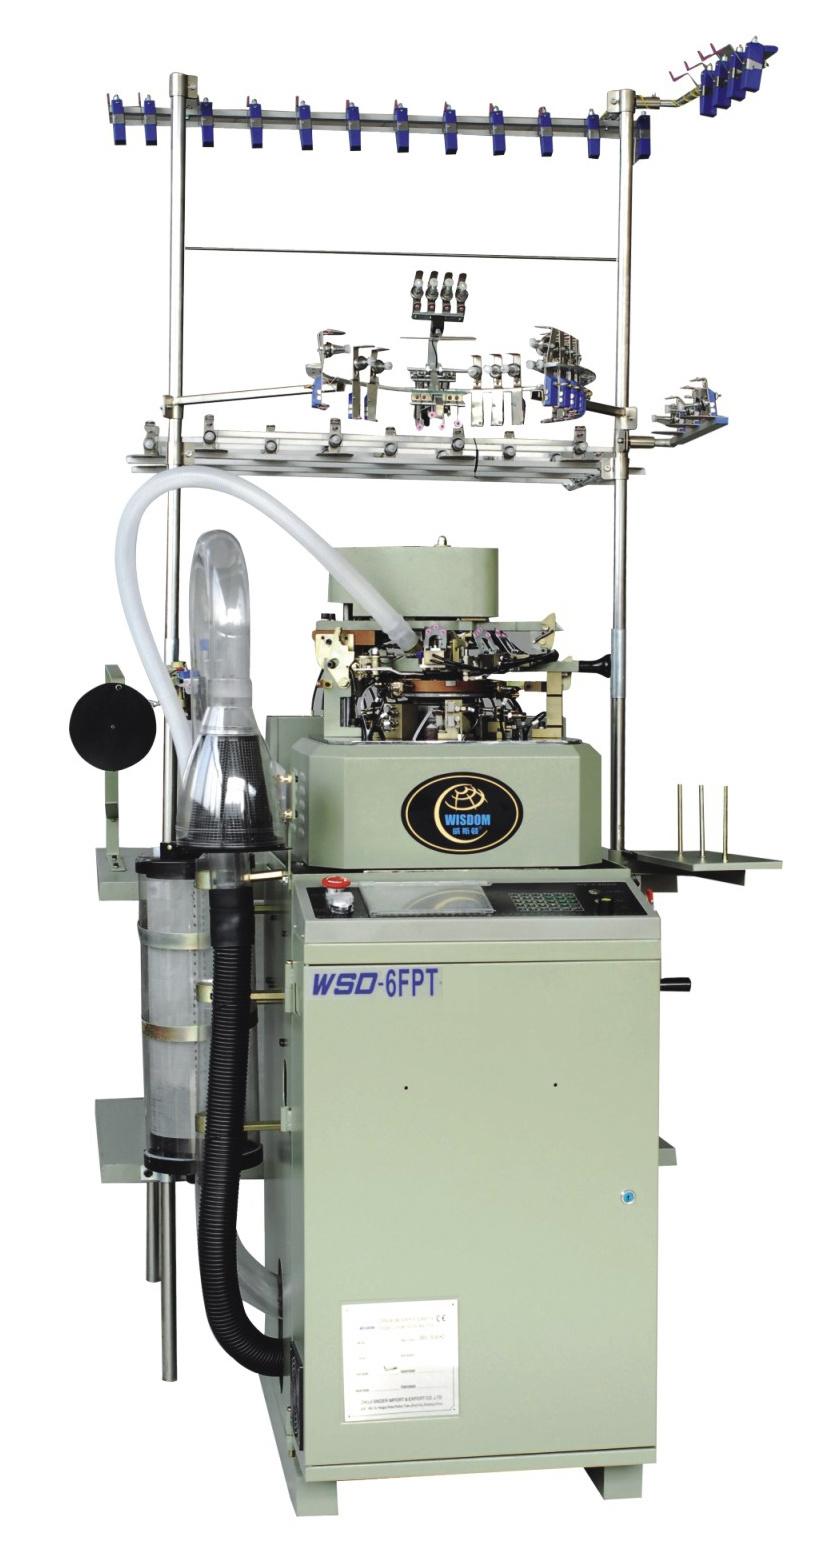 WSD-6FPT Flat Socks Knitting Machine with Single Cylinder